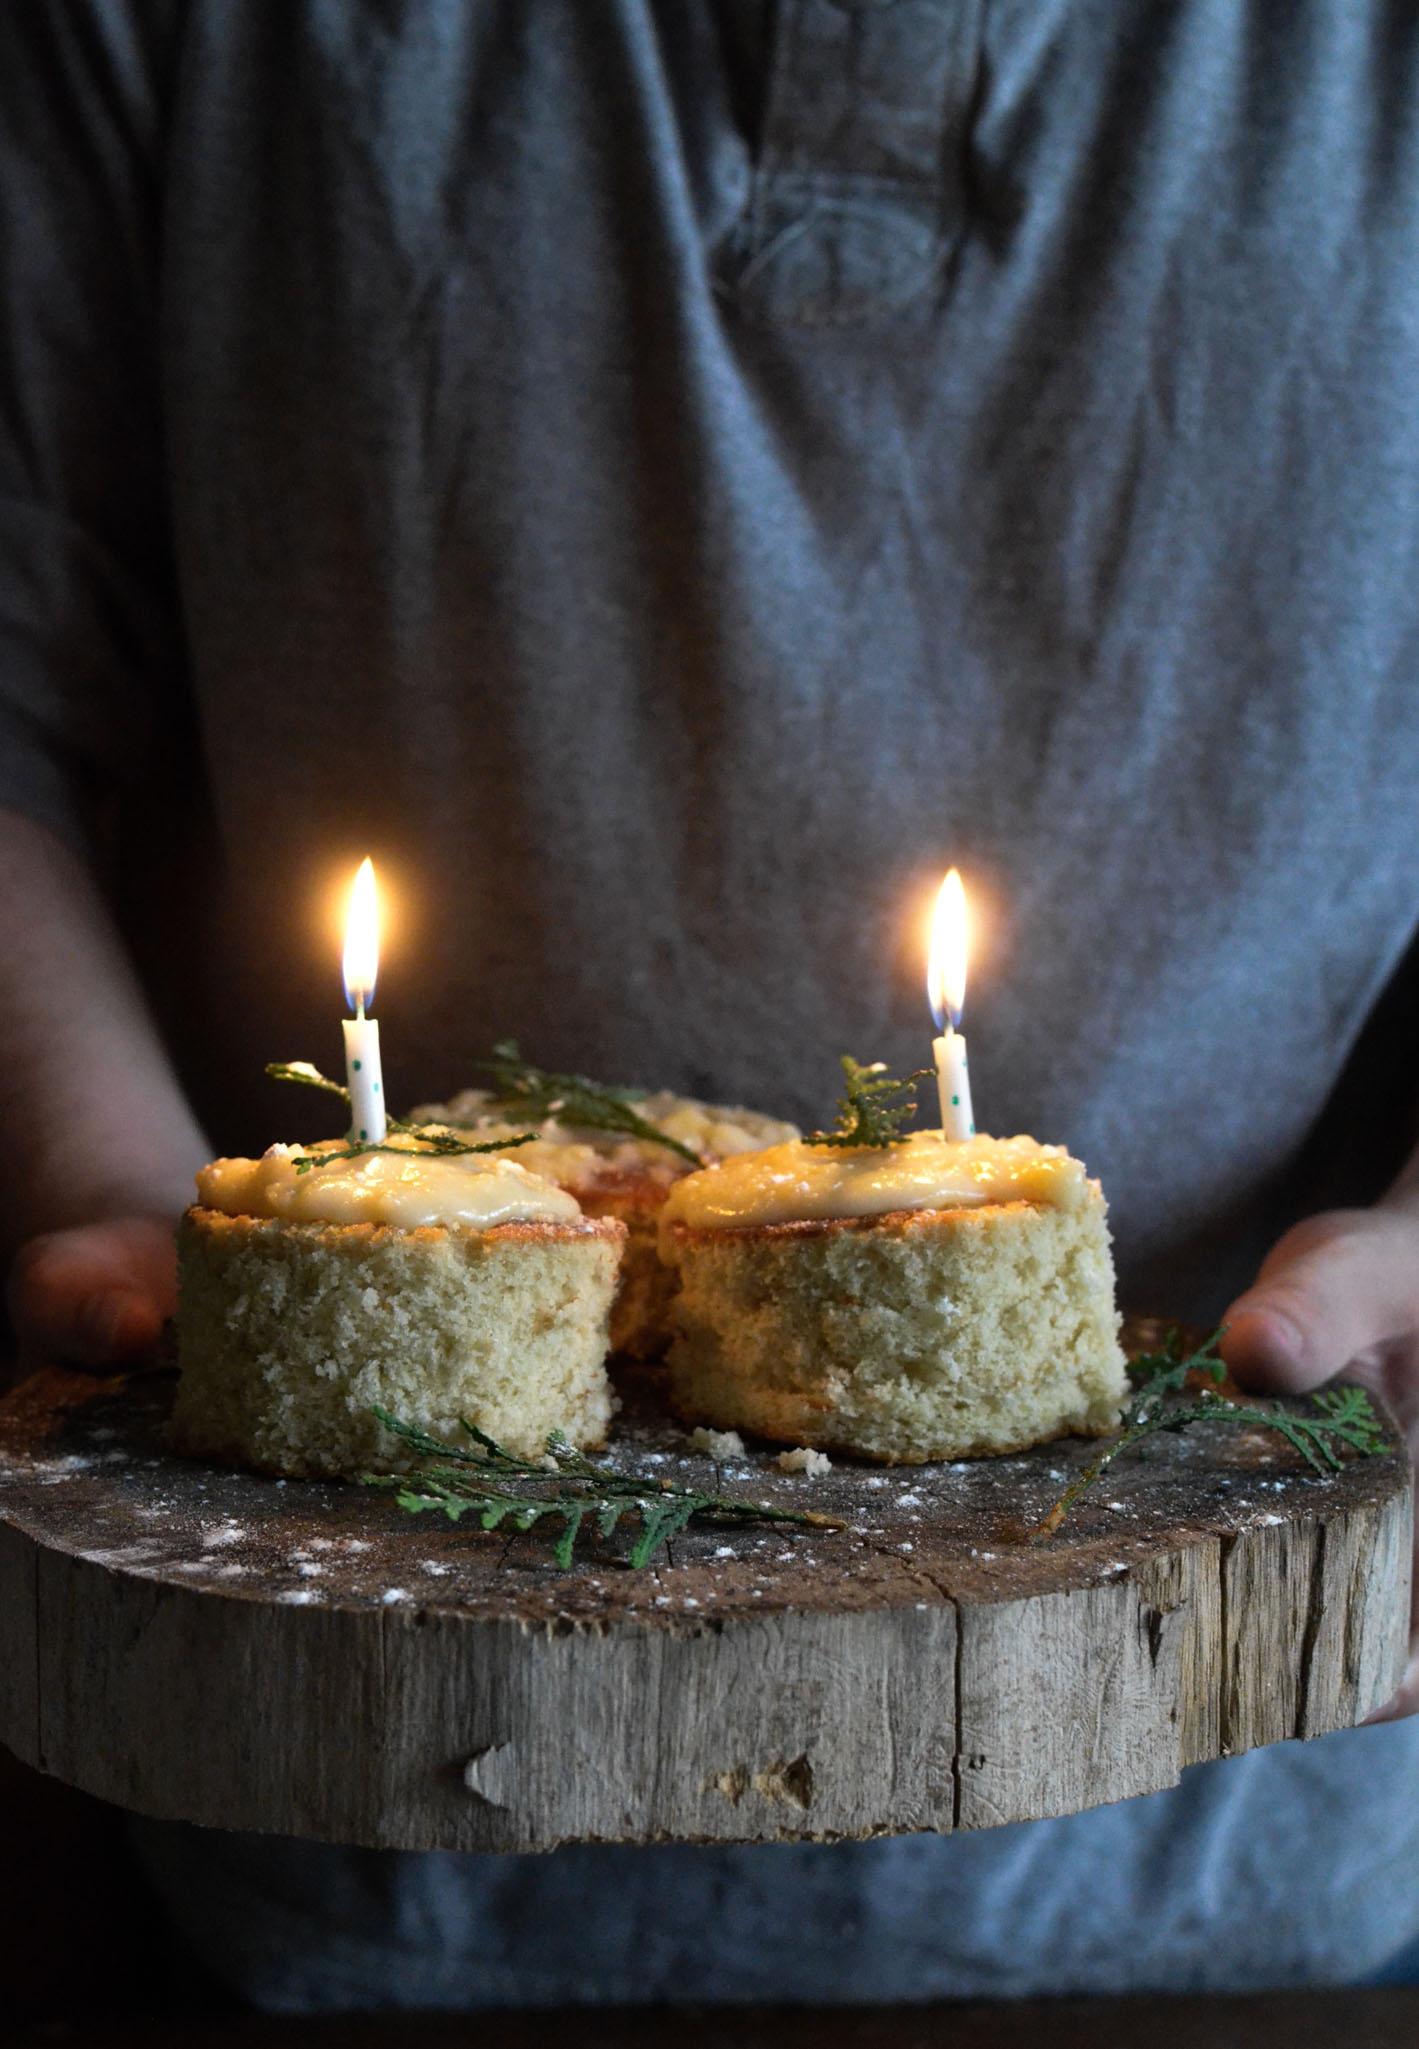 Wendling_Boyd_2_Years_Pudding_Cake.jpg